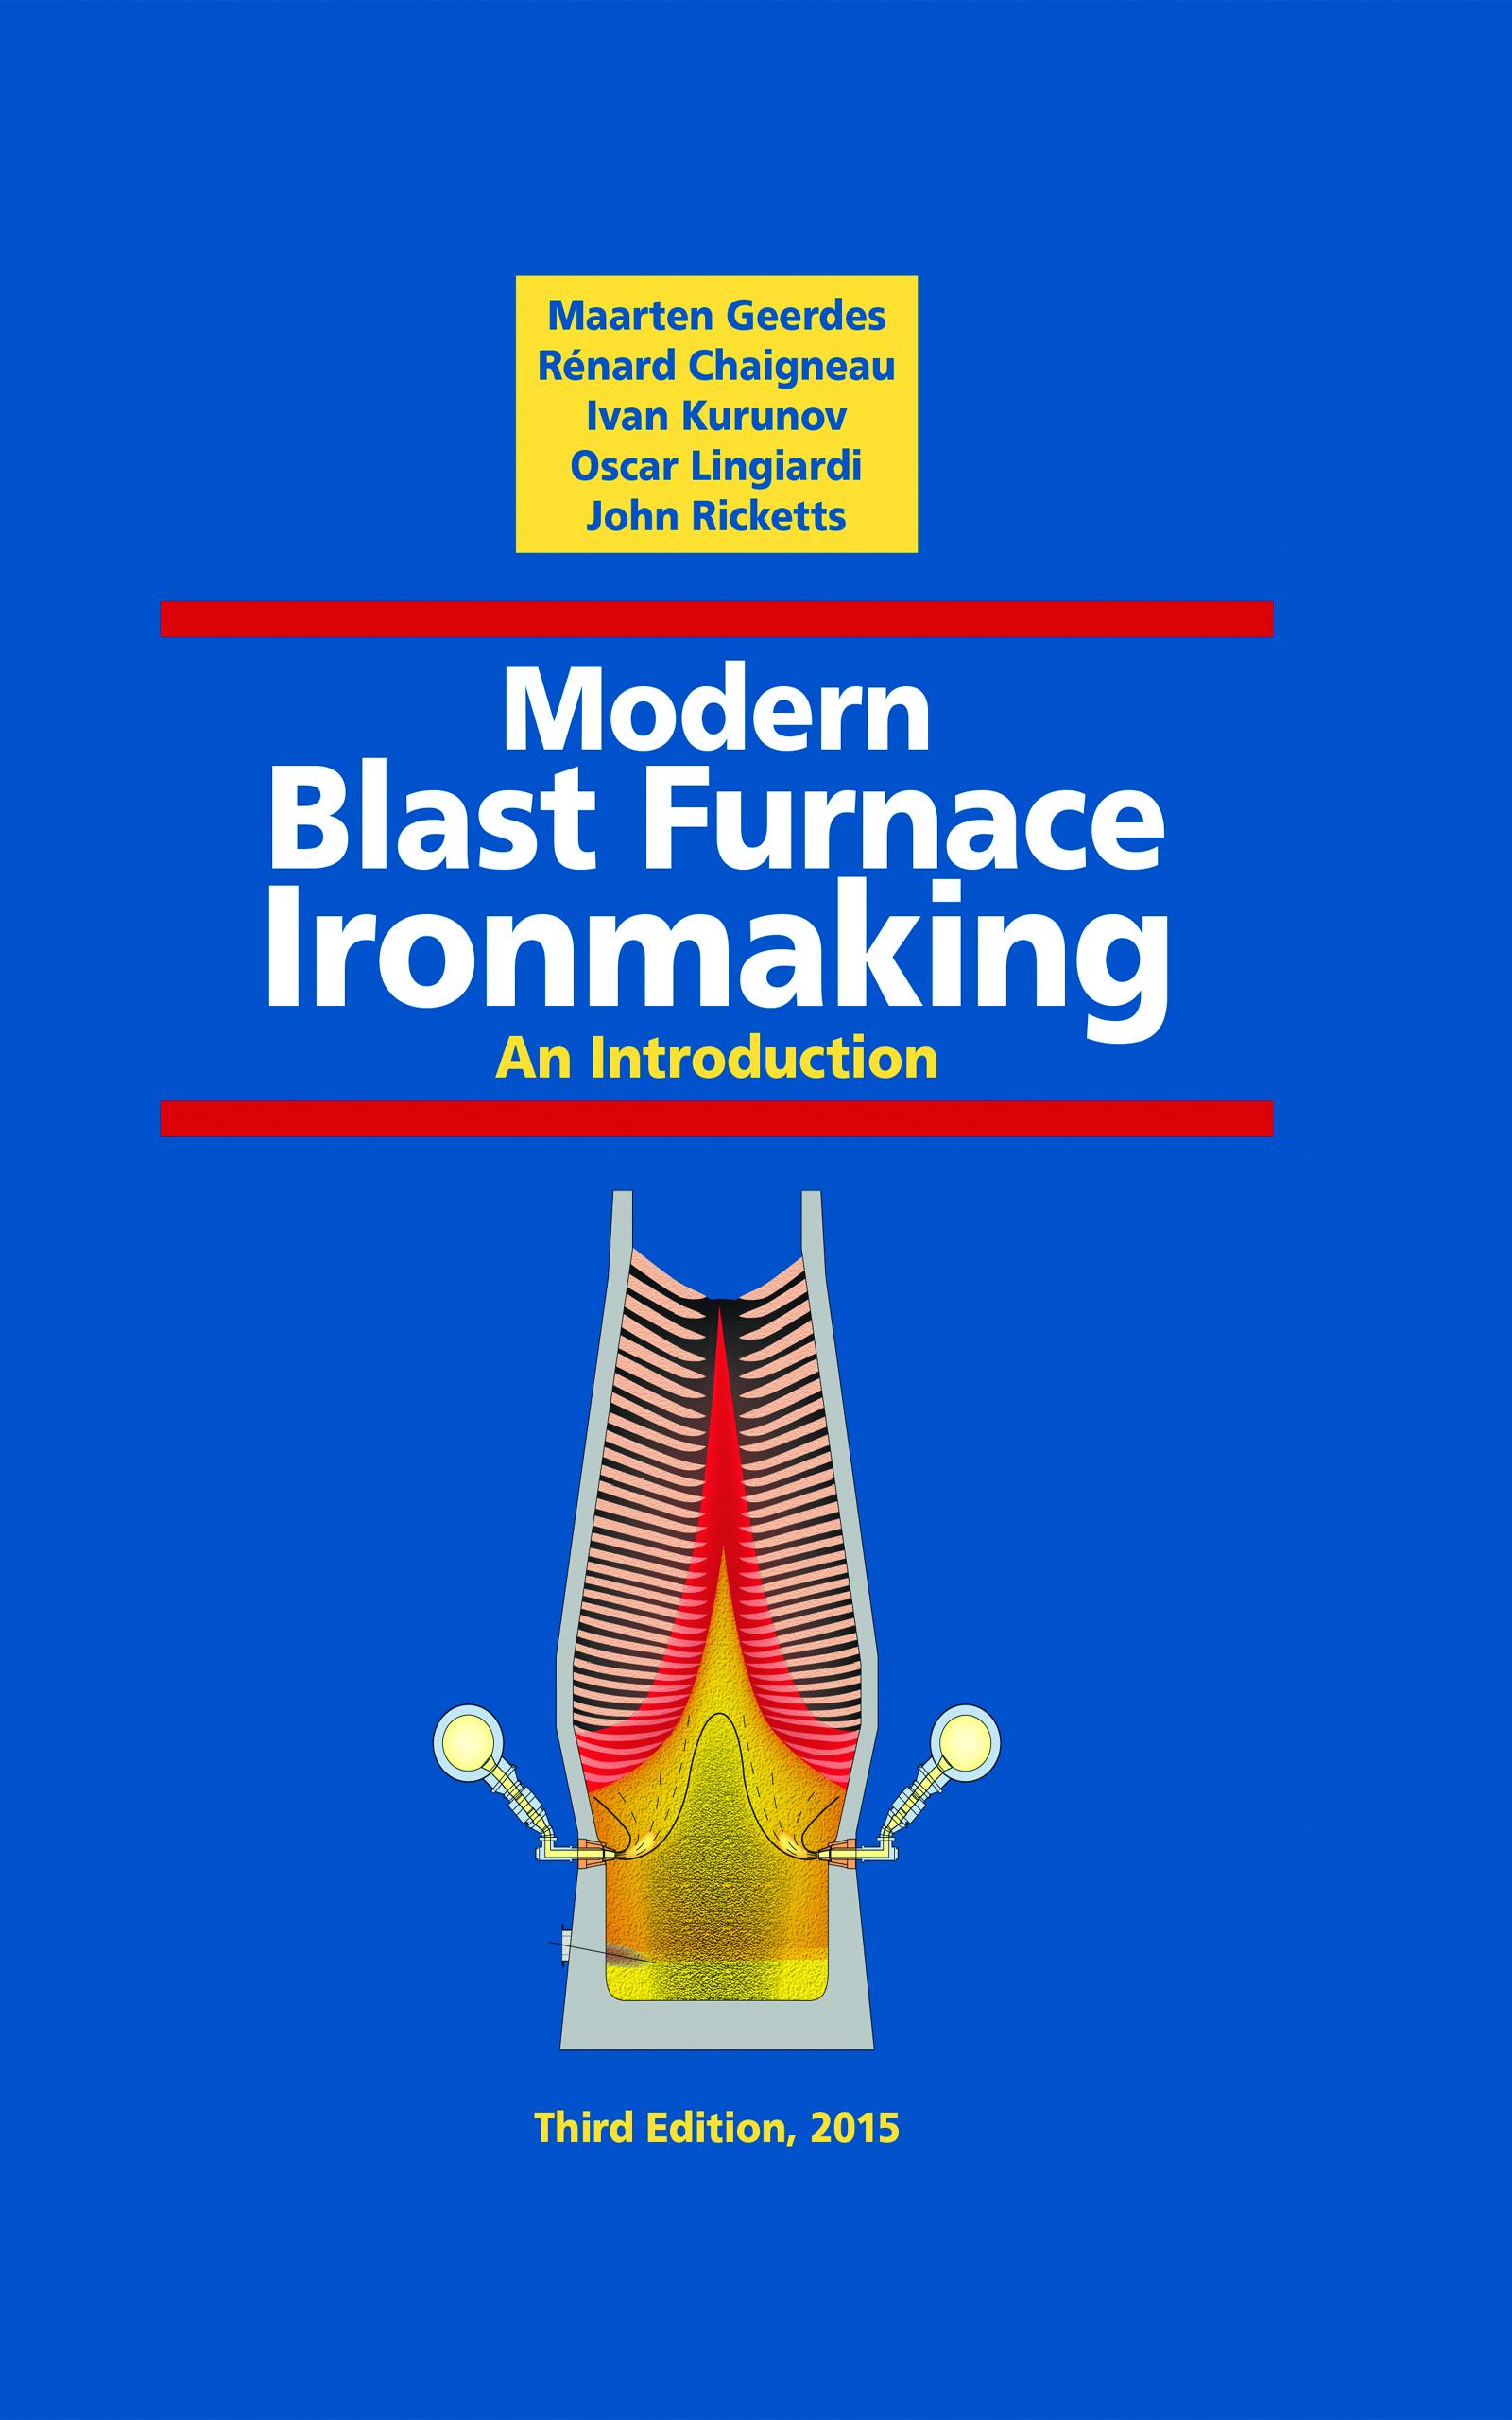 Modern Blast Furnace